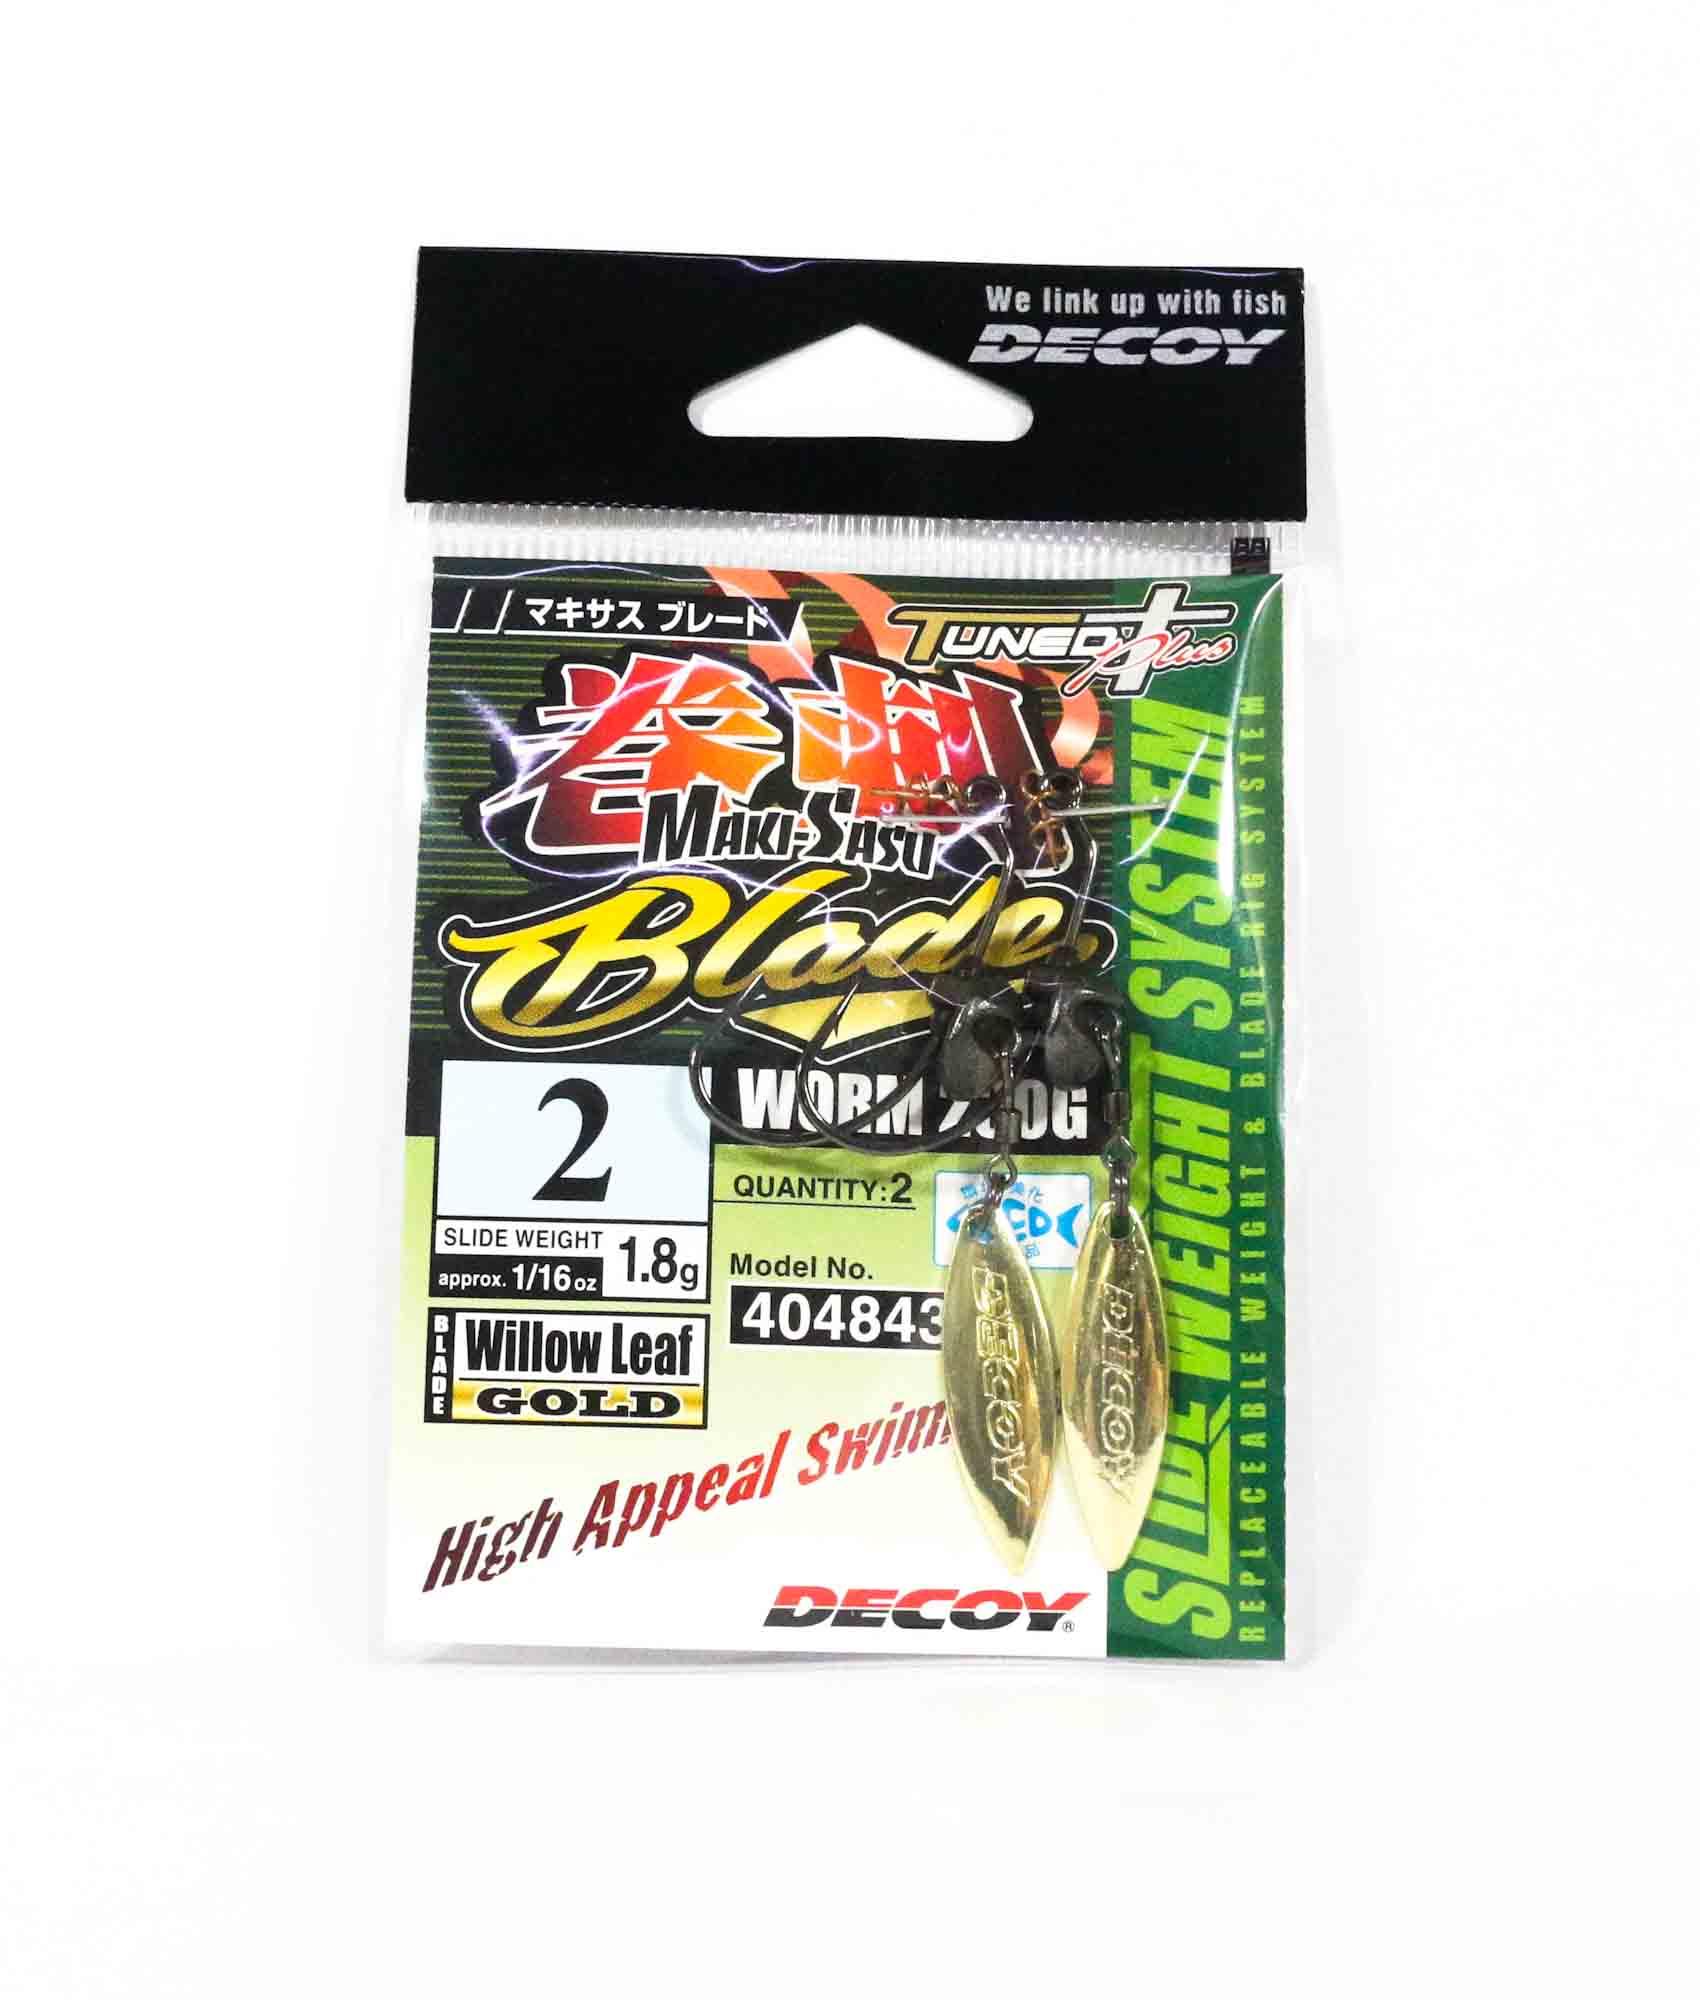 Decoy Worm 230G Maki Sasu Blade Gold Size 2 , 1.8 grams (4843)